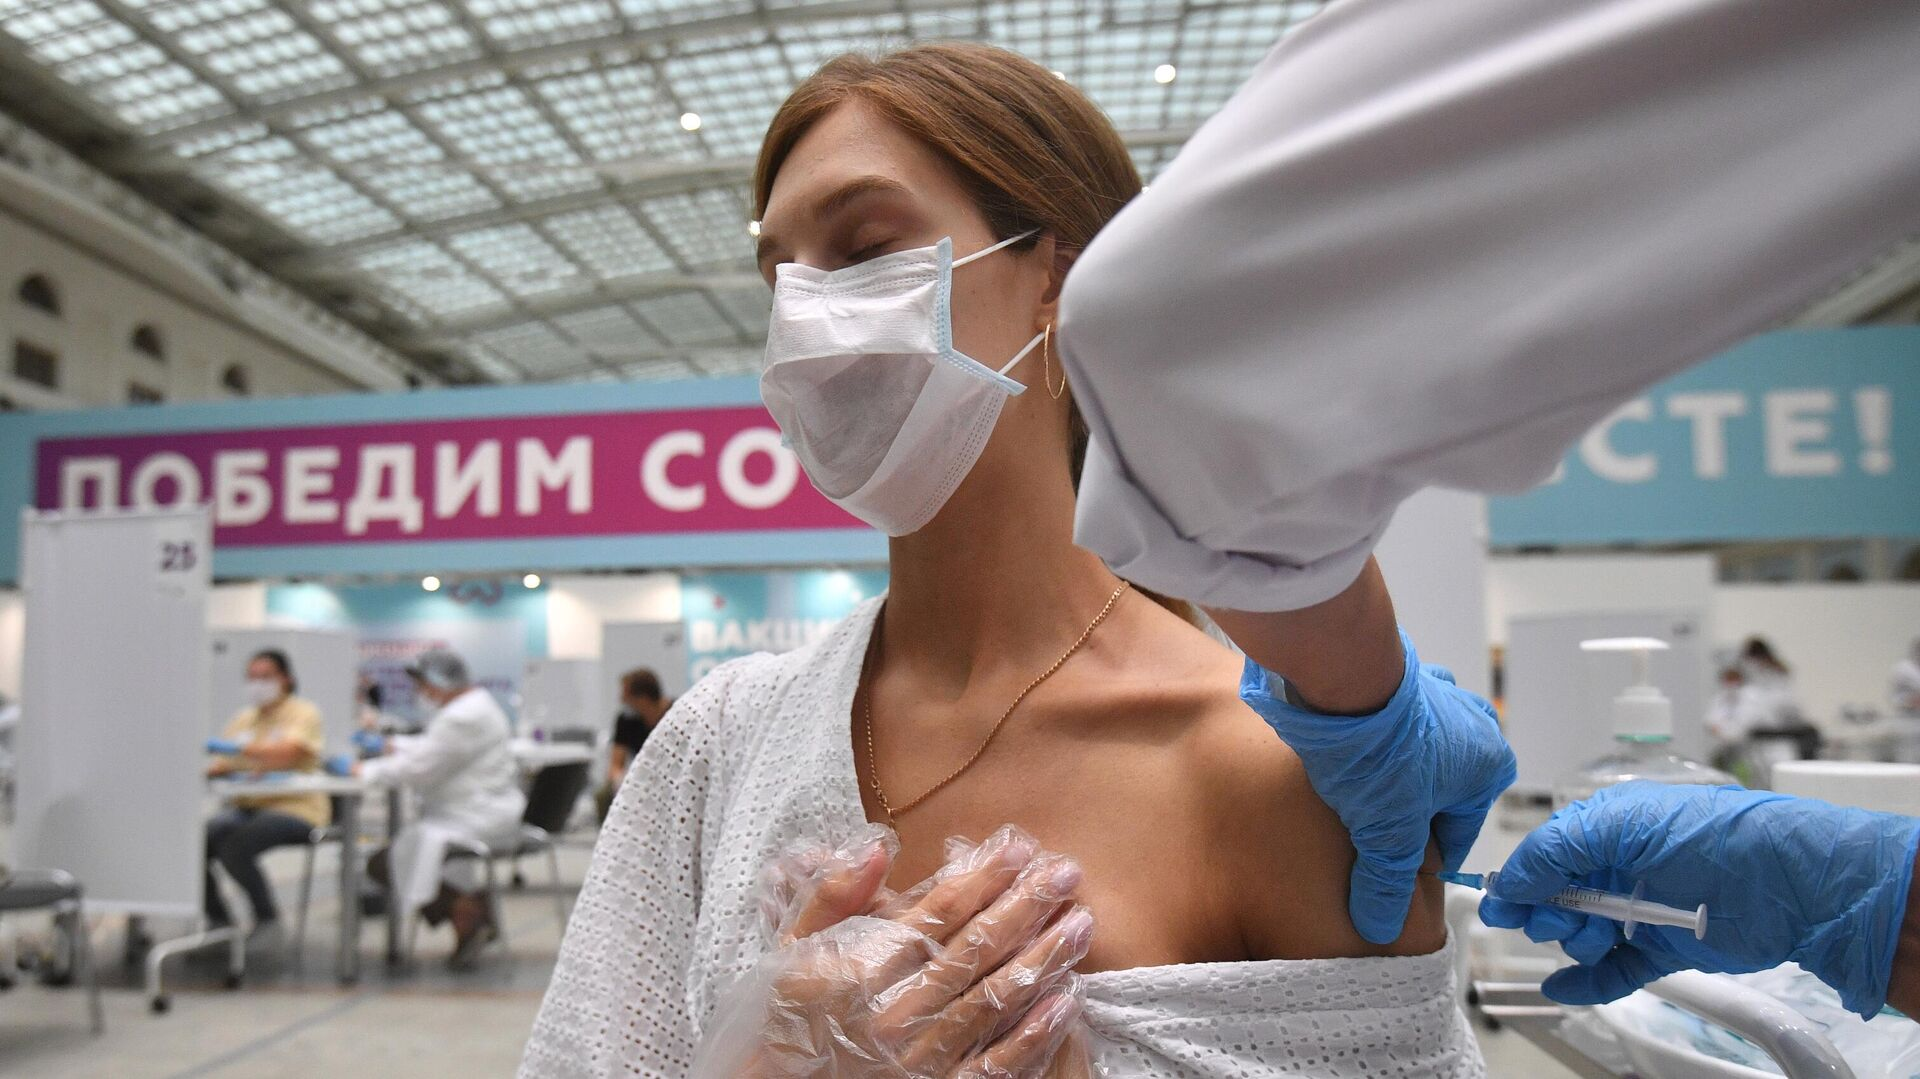 Вакцинация в Гостином дворе - РИА Новости, 1920, 29.07.2021